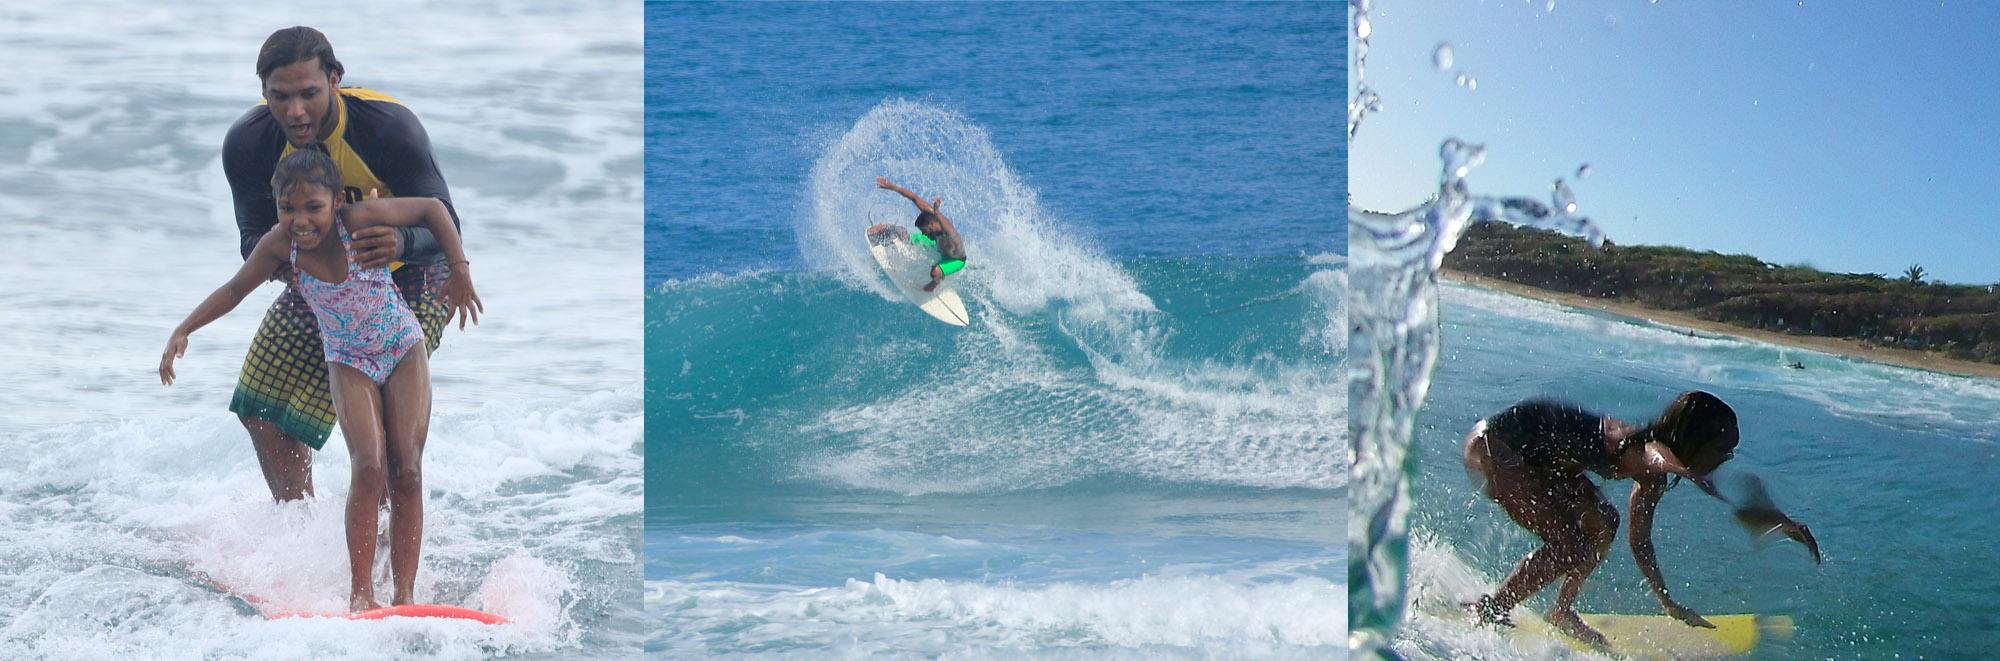 Video Photo Session Chino Surf Schoolchino Surf School